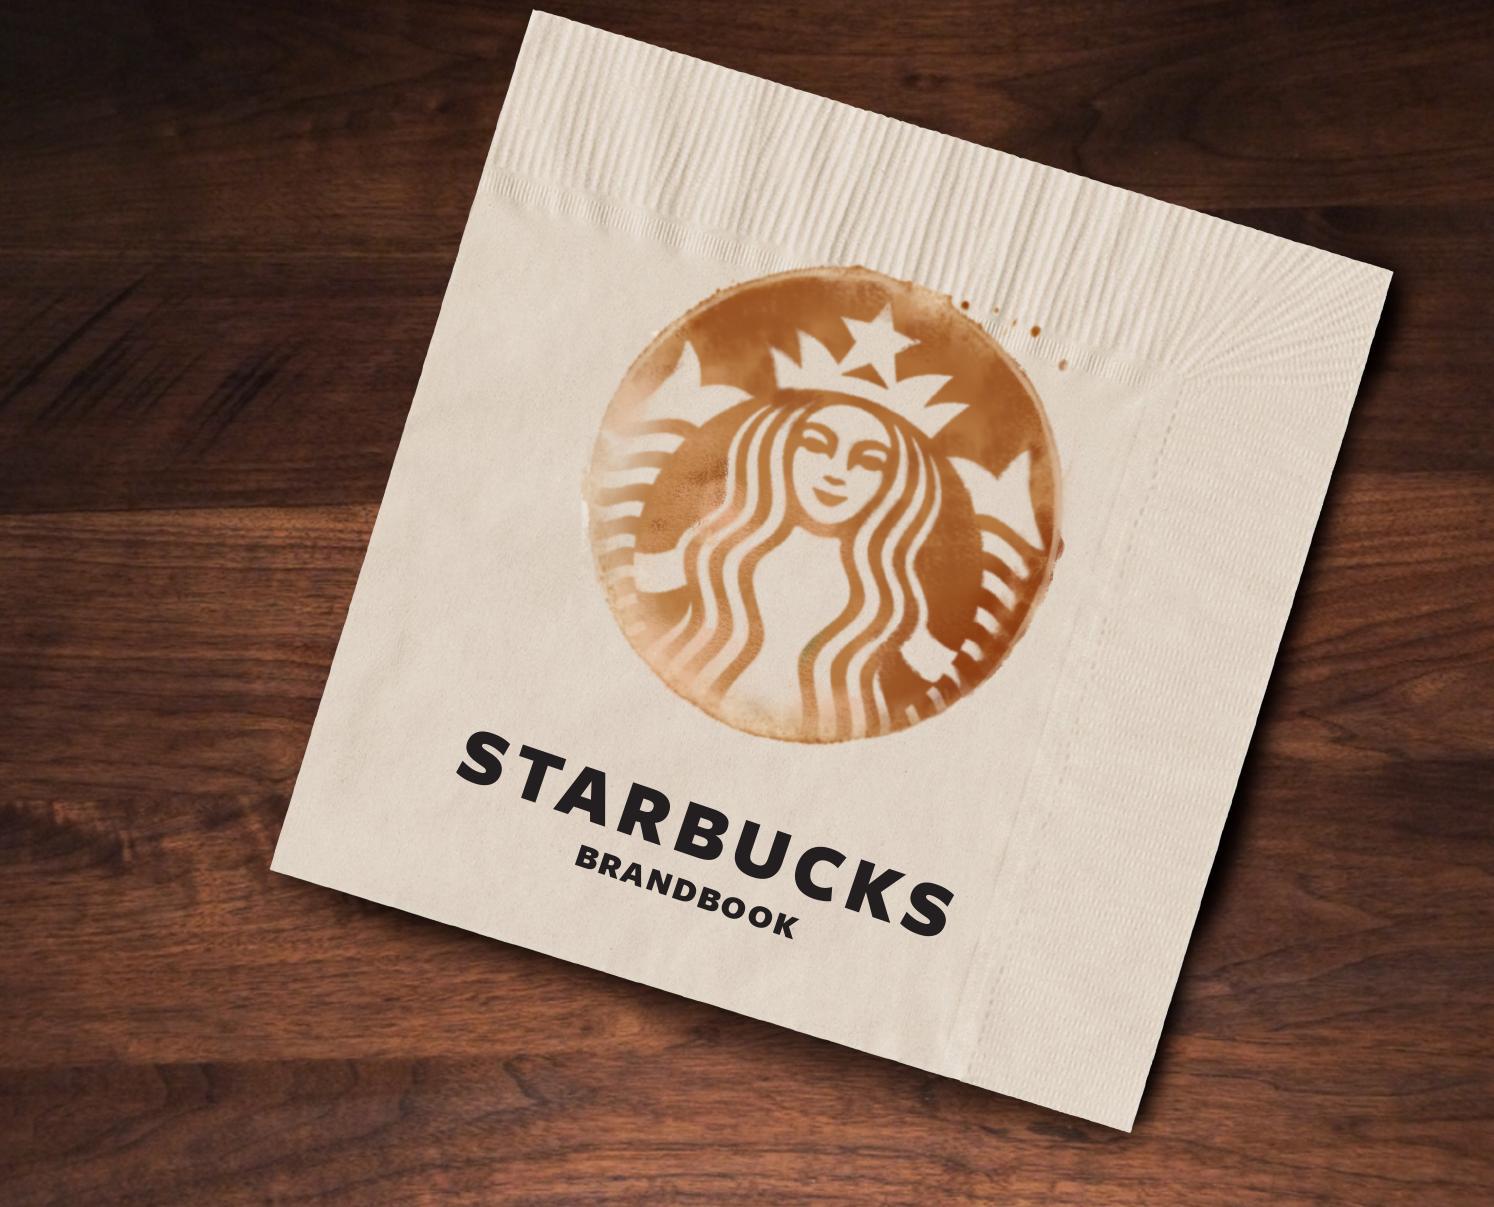 starbucks brandbook